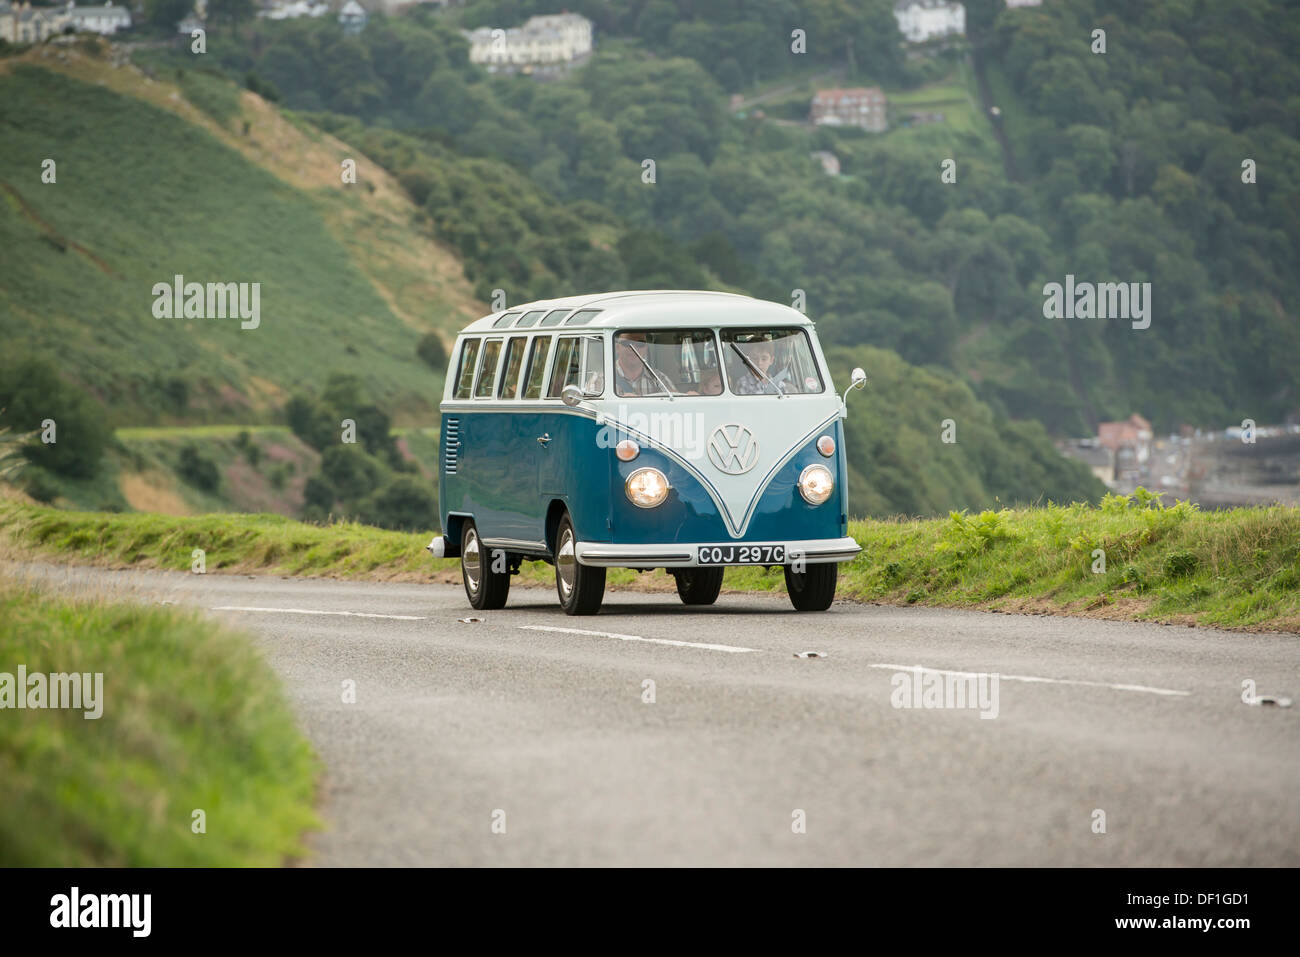 classic VW 1965 original British RHD 21 window caravette campervan travelling around the countryside, Devon, UK - Stock Image